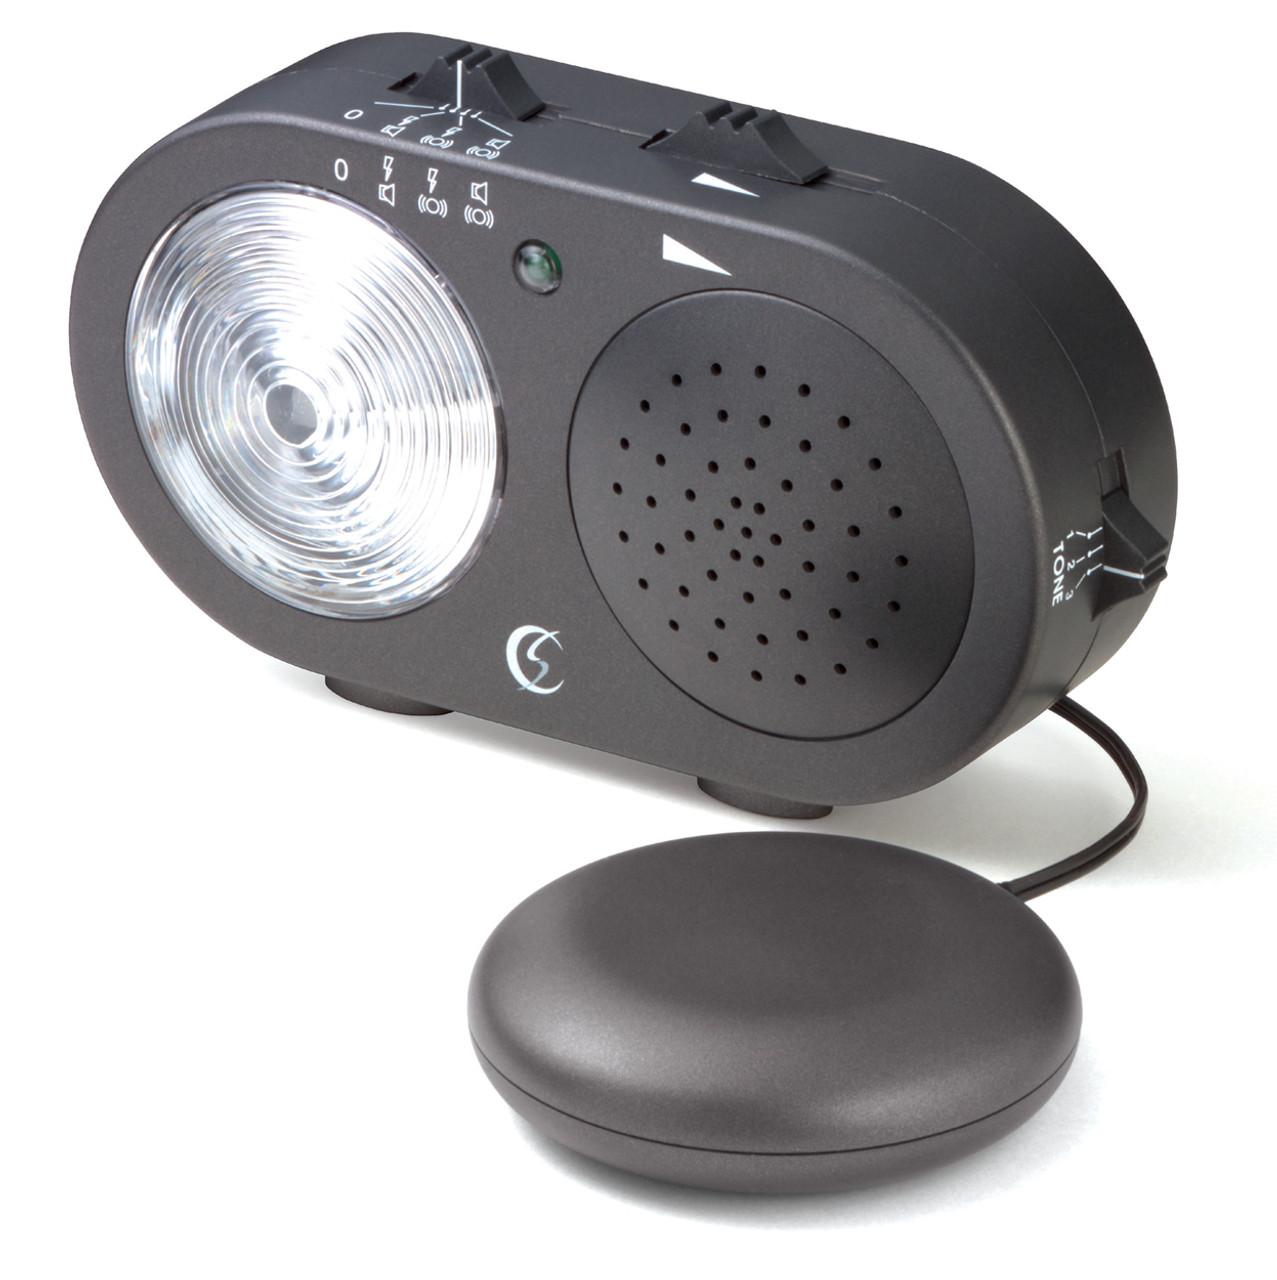 Geemarc CL-1 Telephone Ringer/Signaler